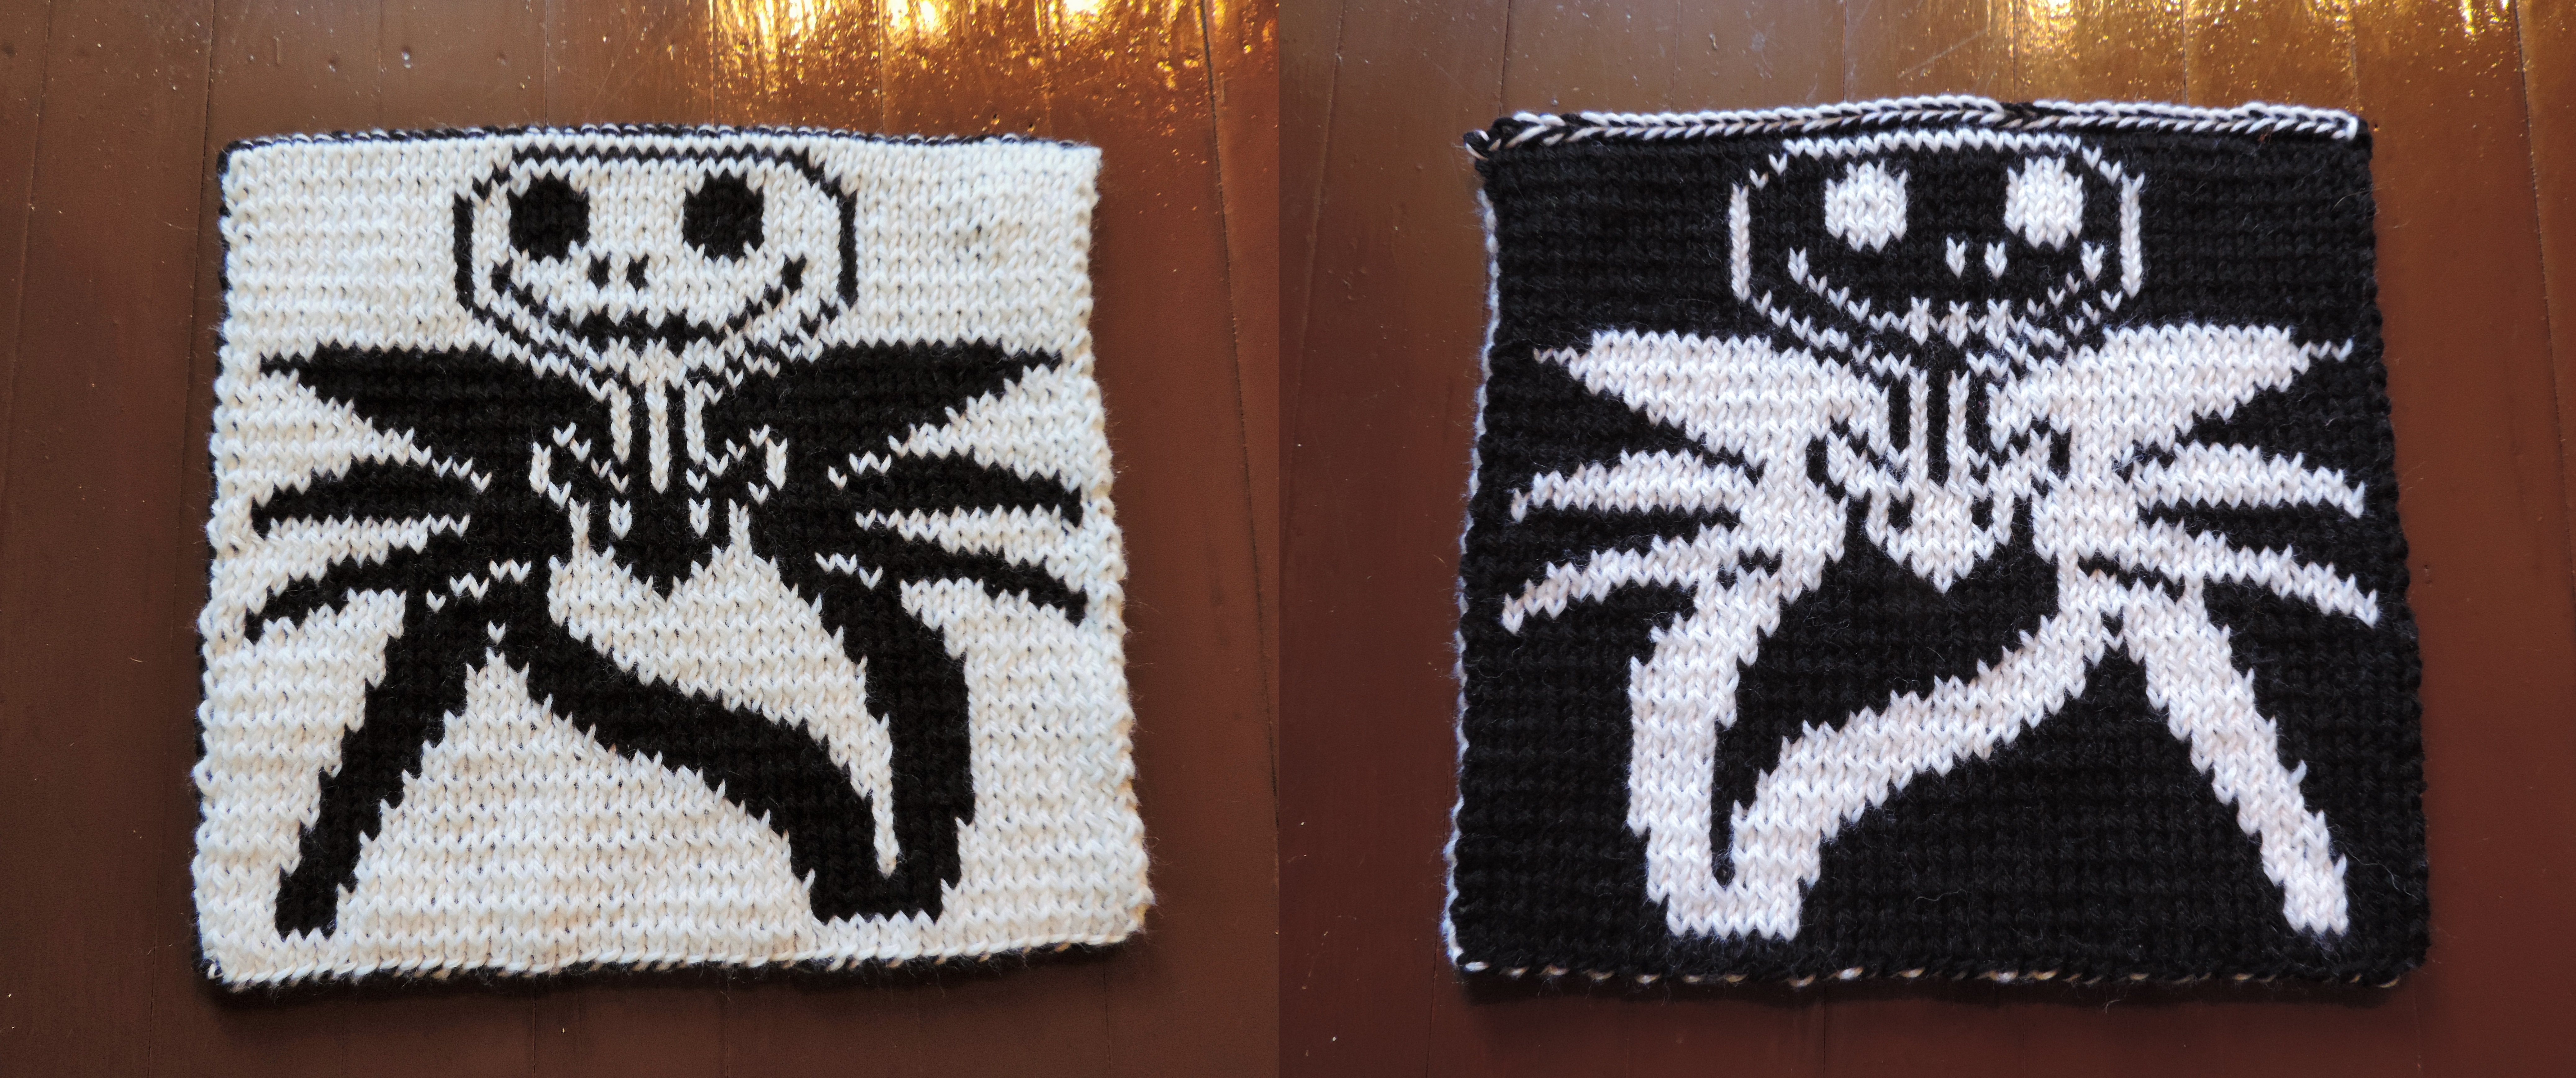 Free Crochet Pattern For Jack Skellington : 2014 Geek-A-Long: Jack Skellington ? Lattes & Llamas